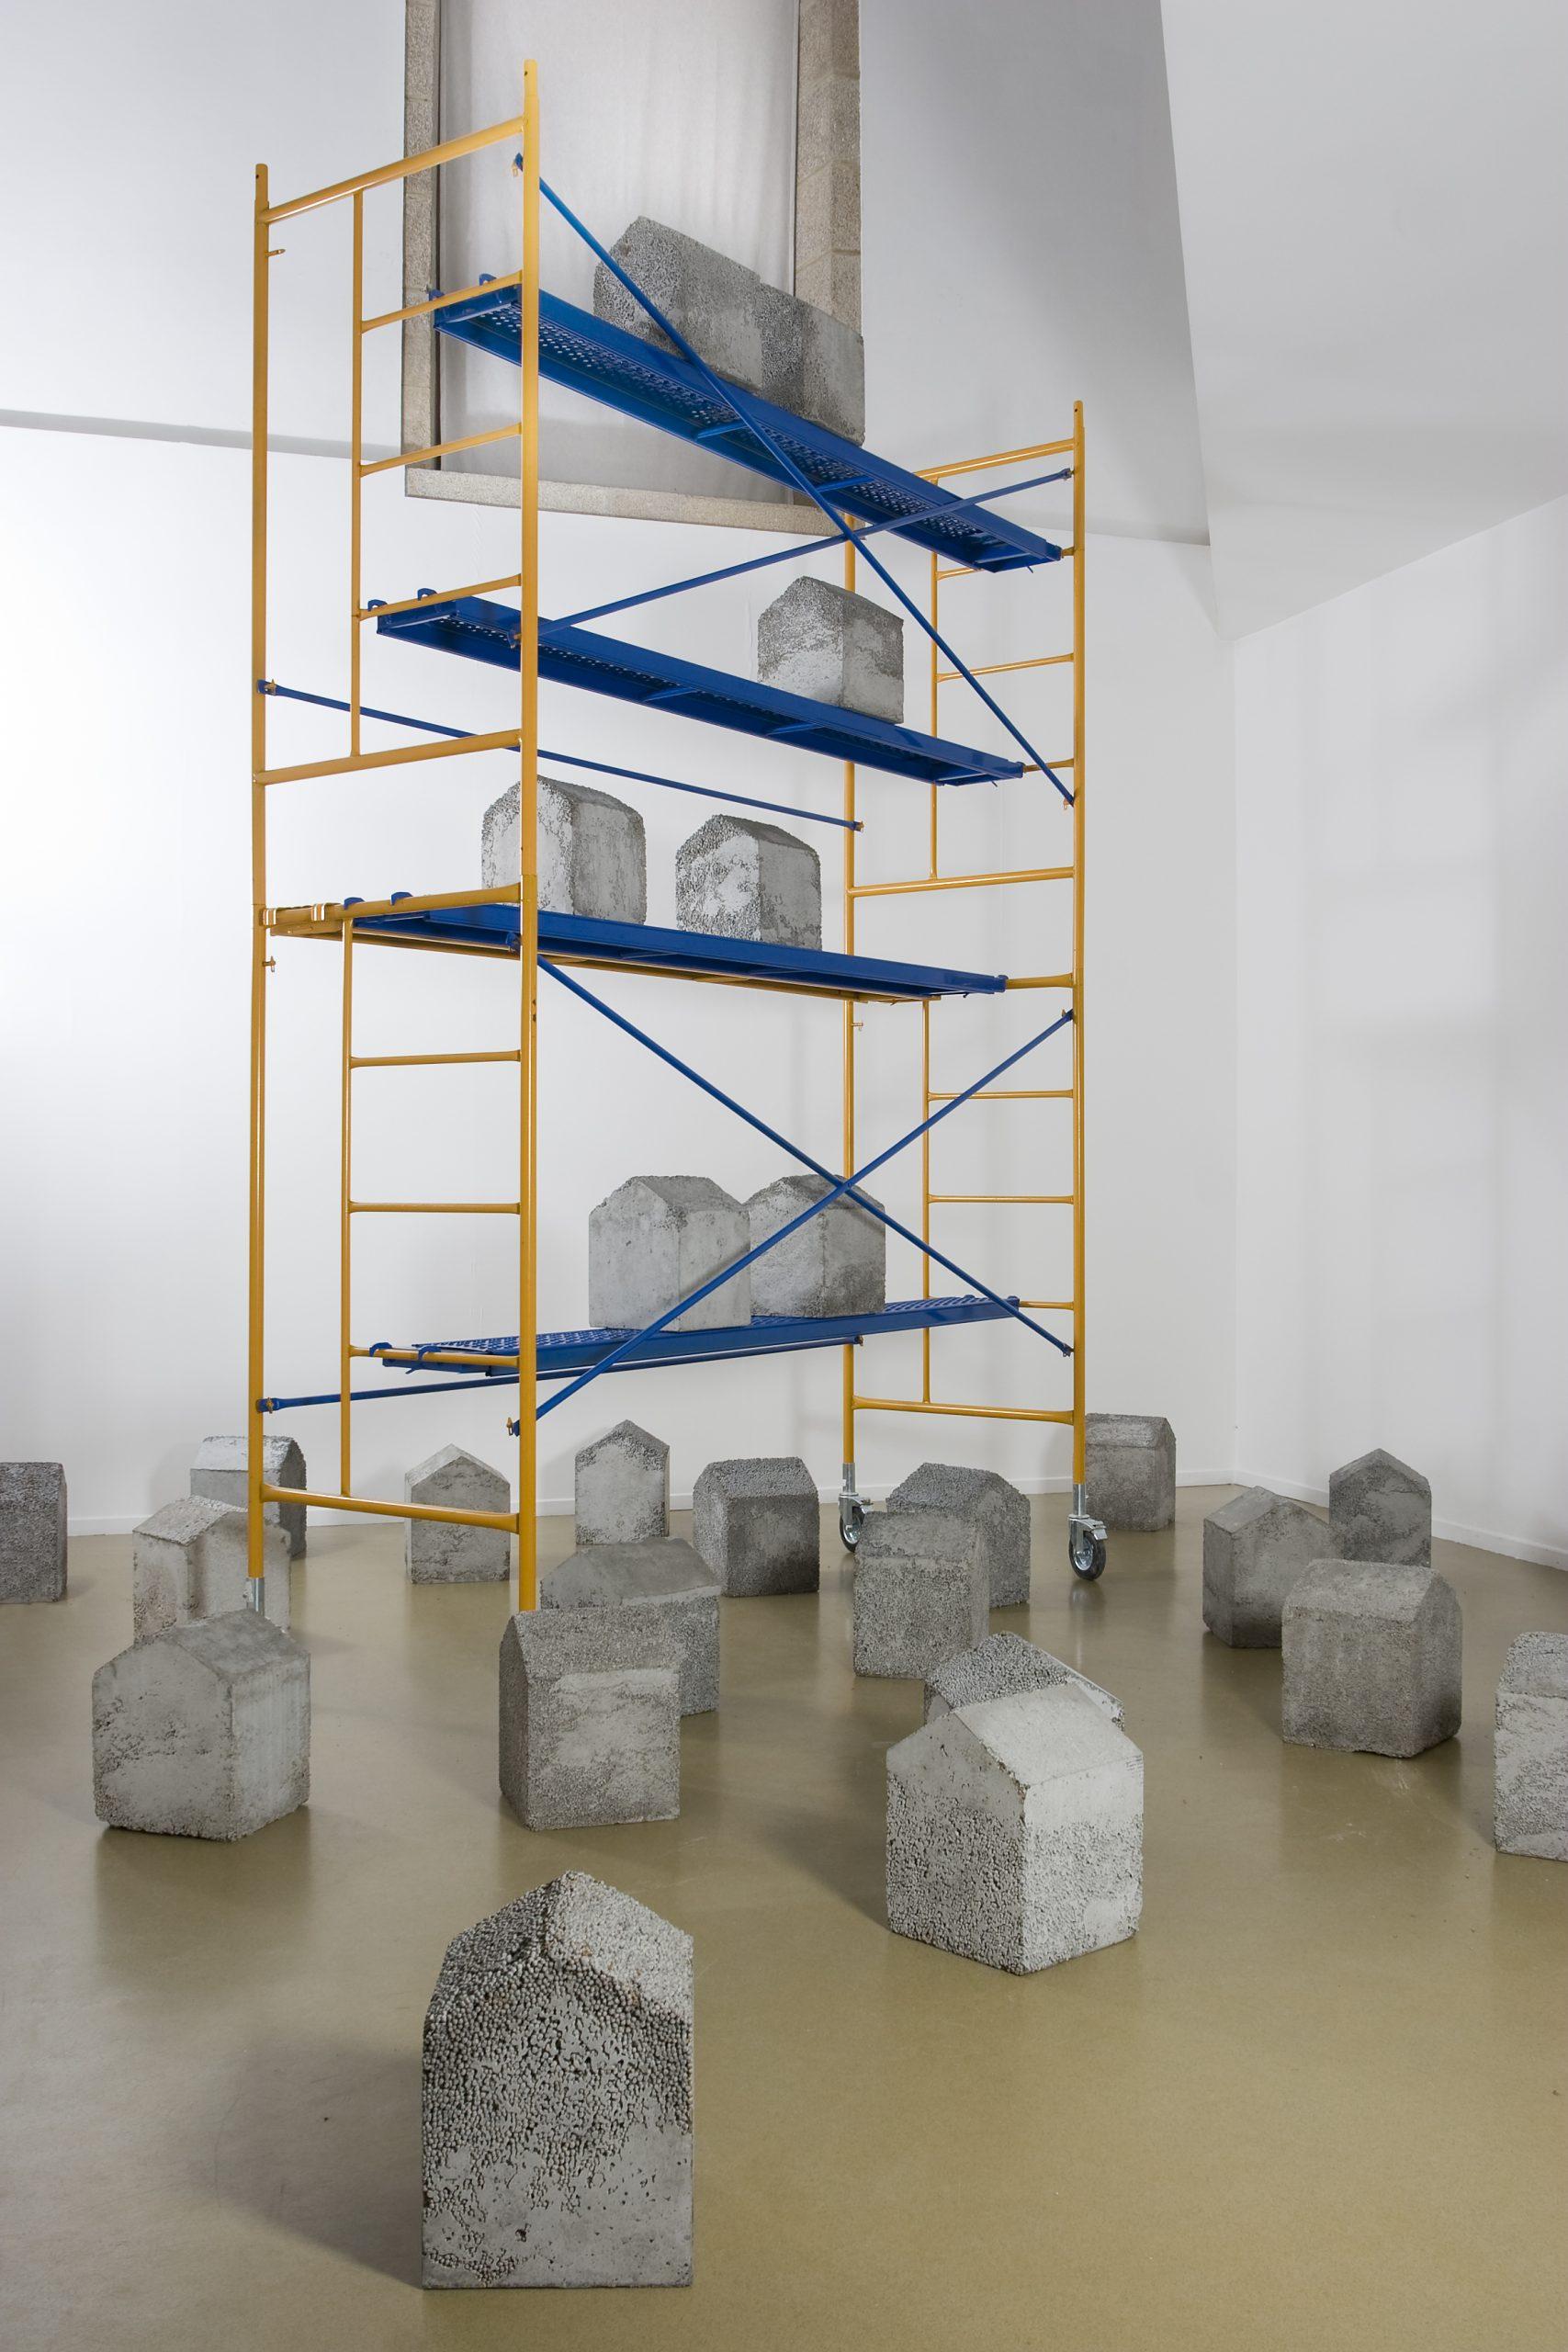 Caxigueiro participa na mostra Galicia Futura